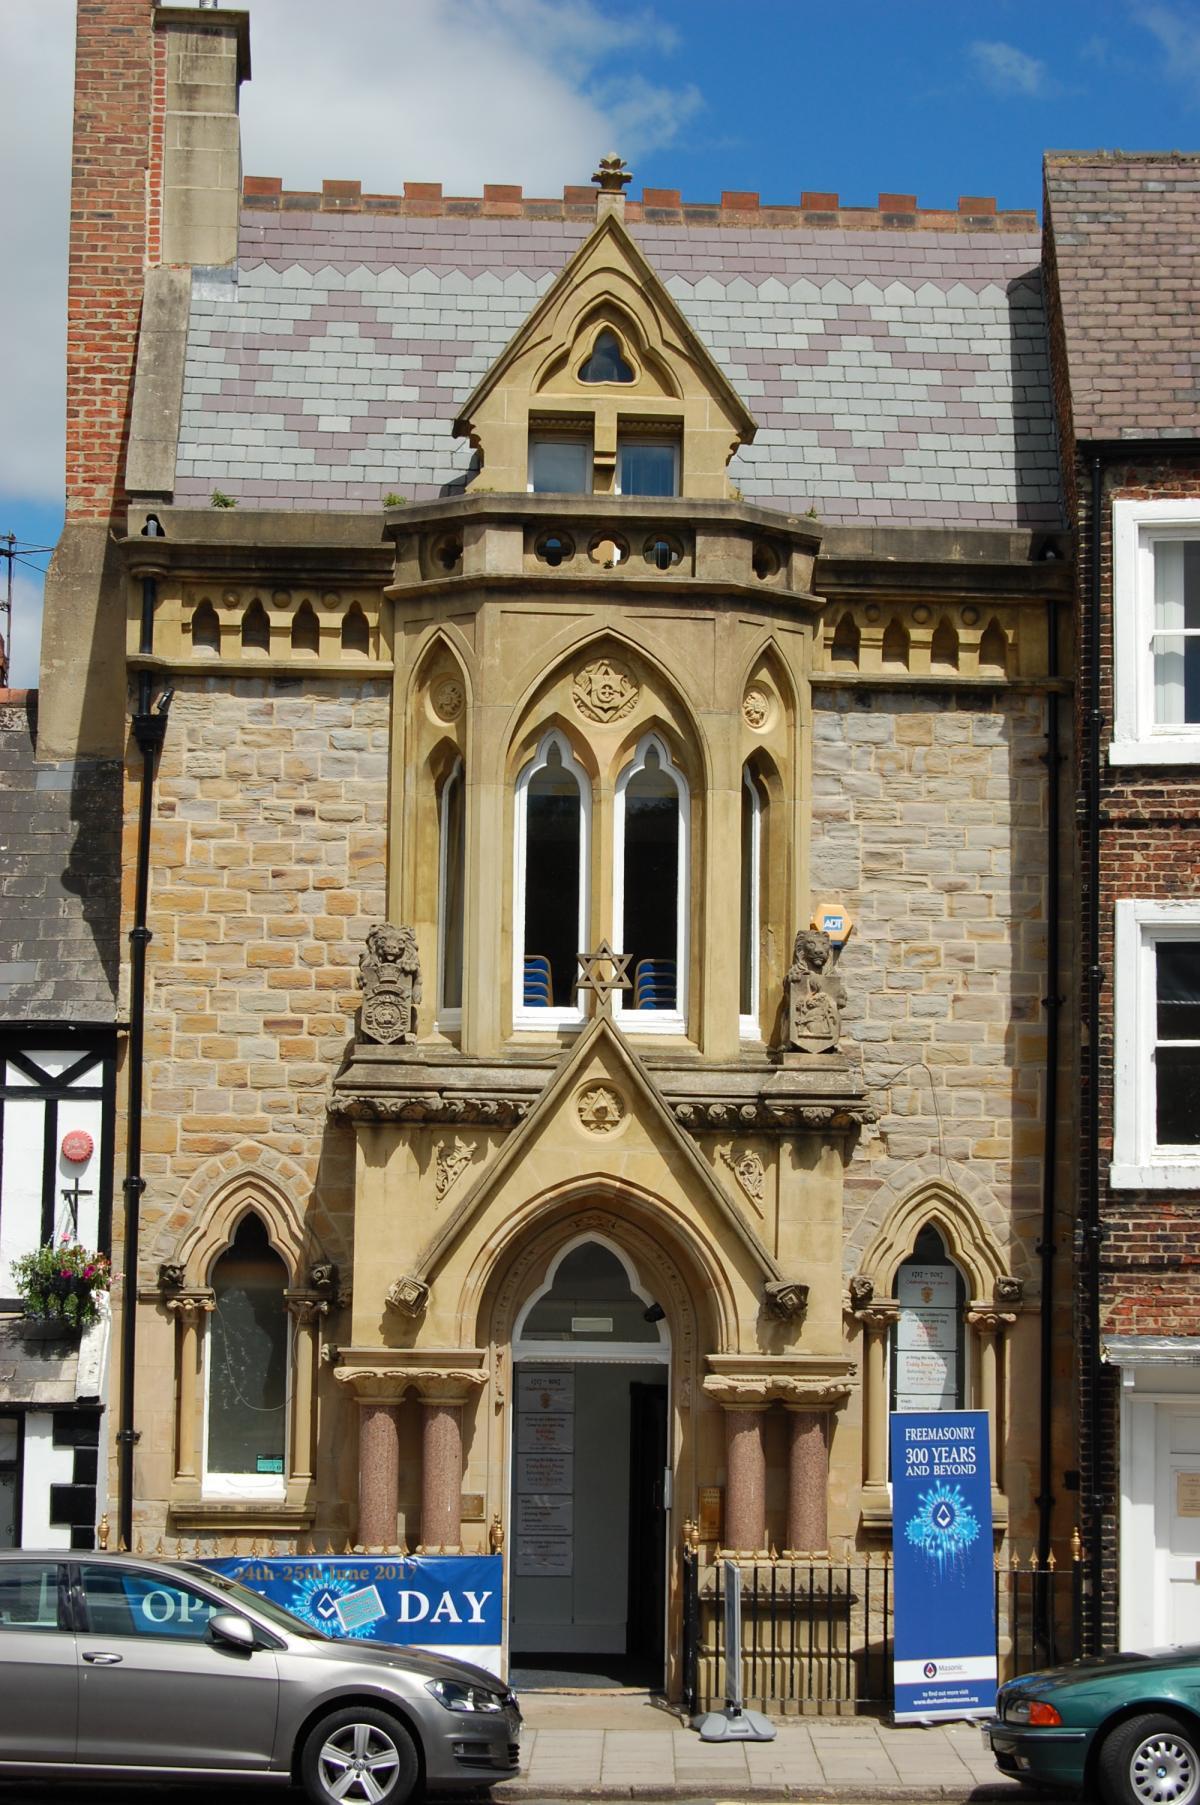 Masonic Lodge In Old Elvet Durham Opens Doors To Celebrate 300